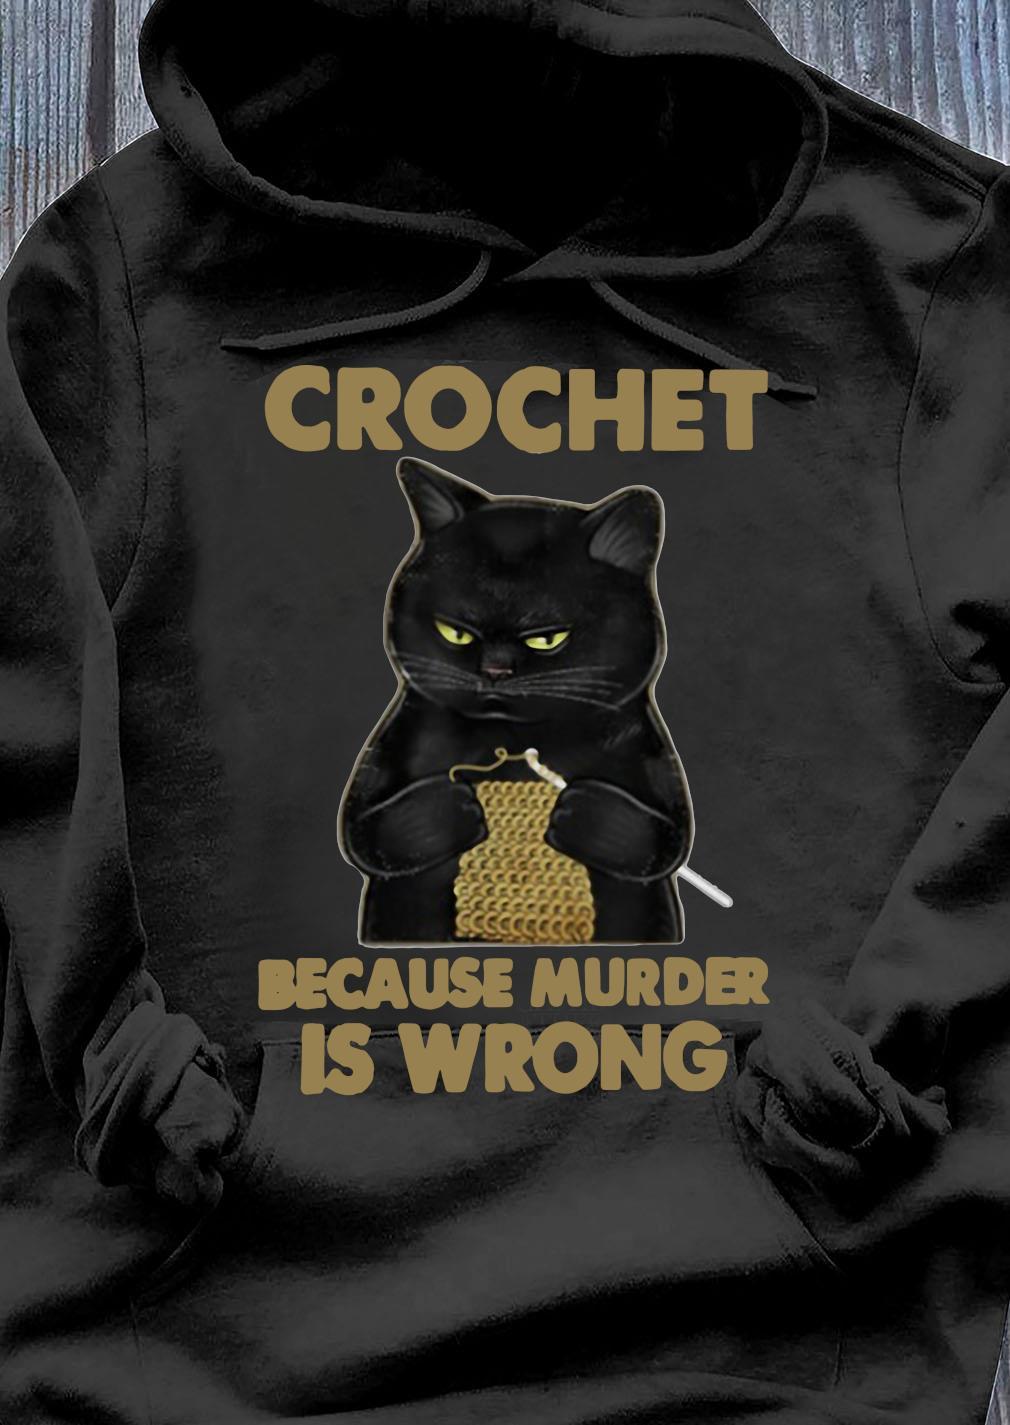 Crochet Because Murder Is Wrong Crochet Black Cat Yarn Shirt Hoodie